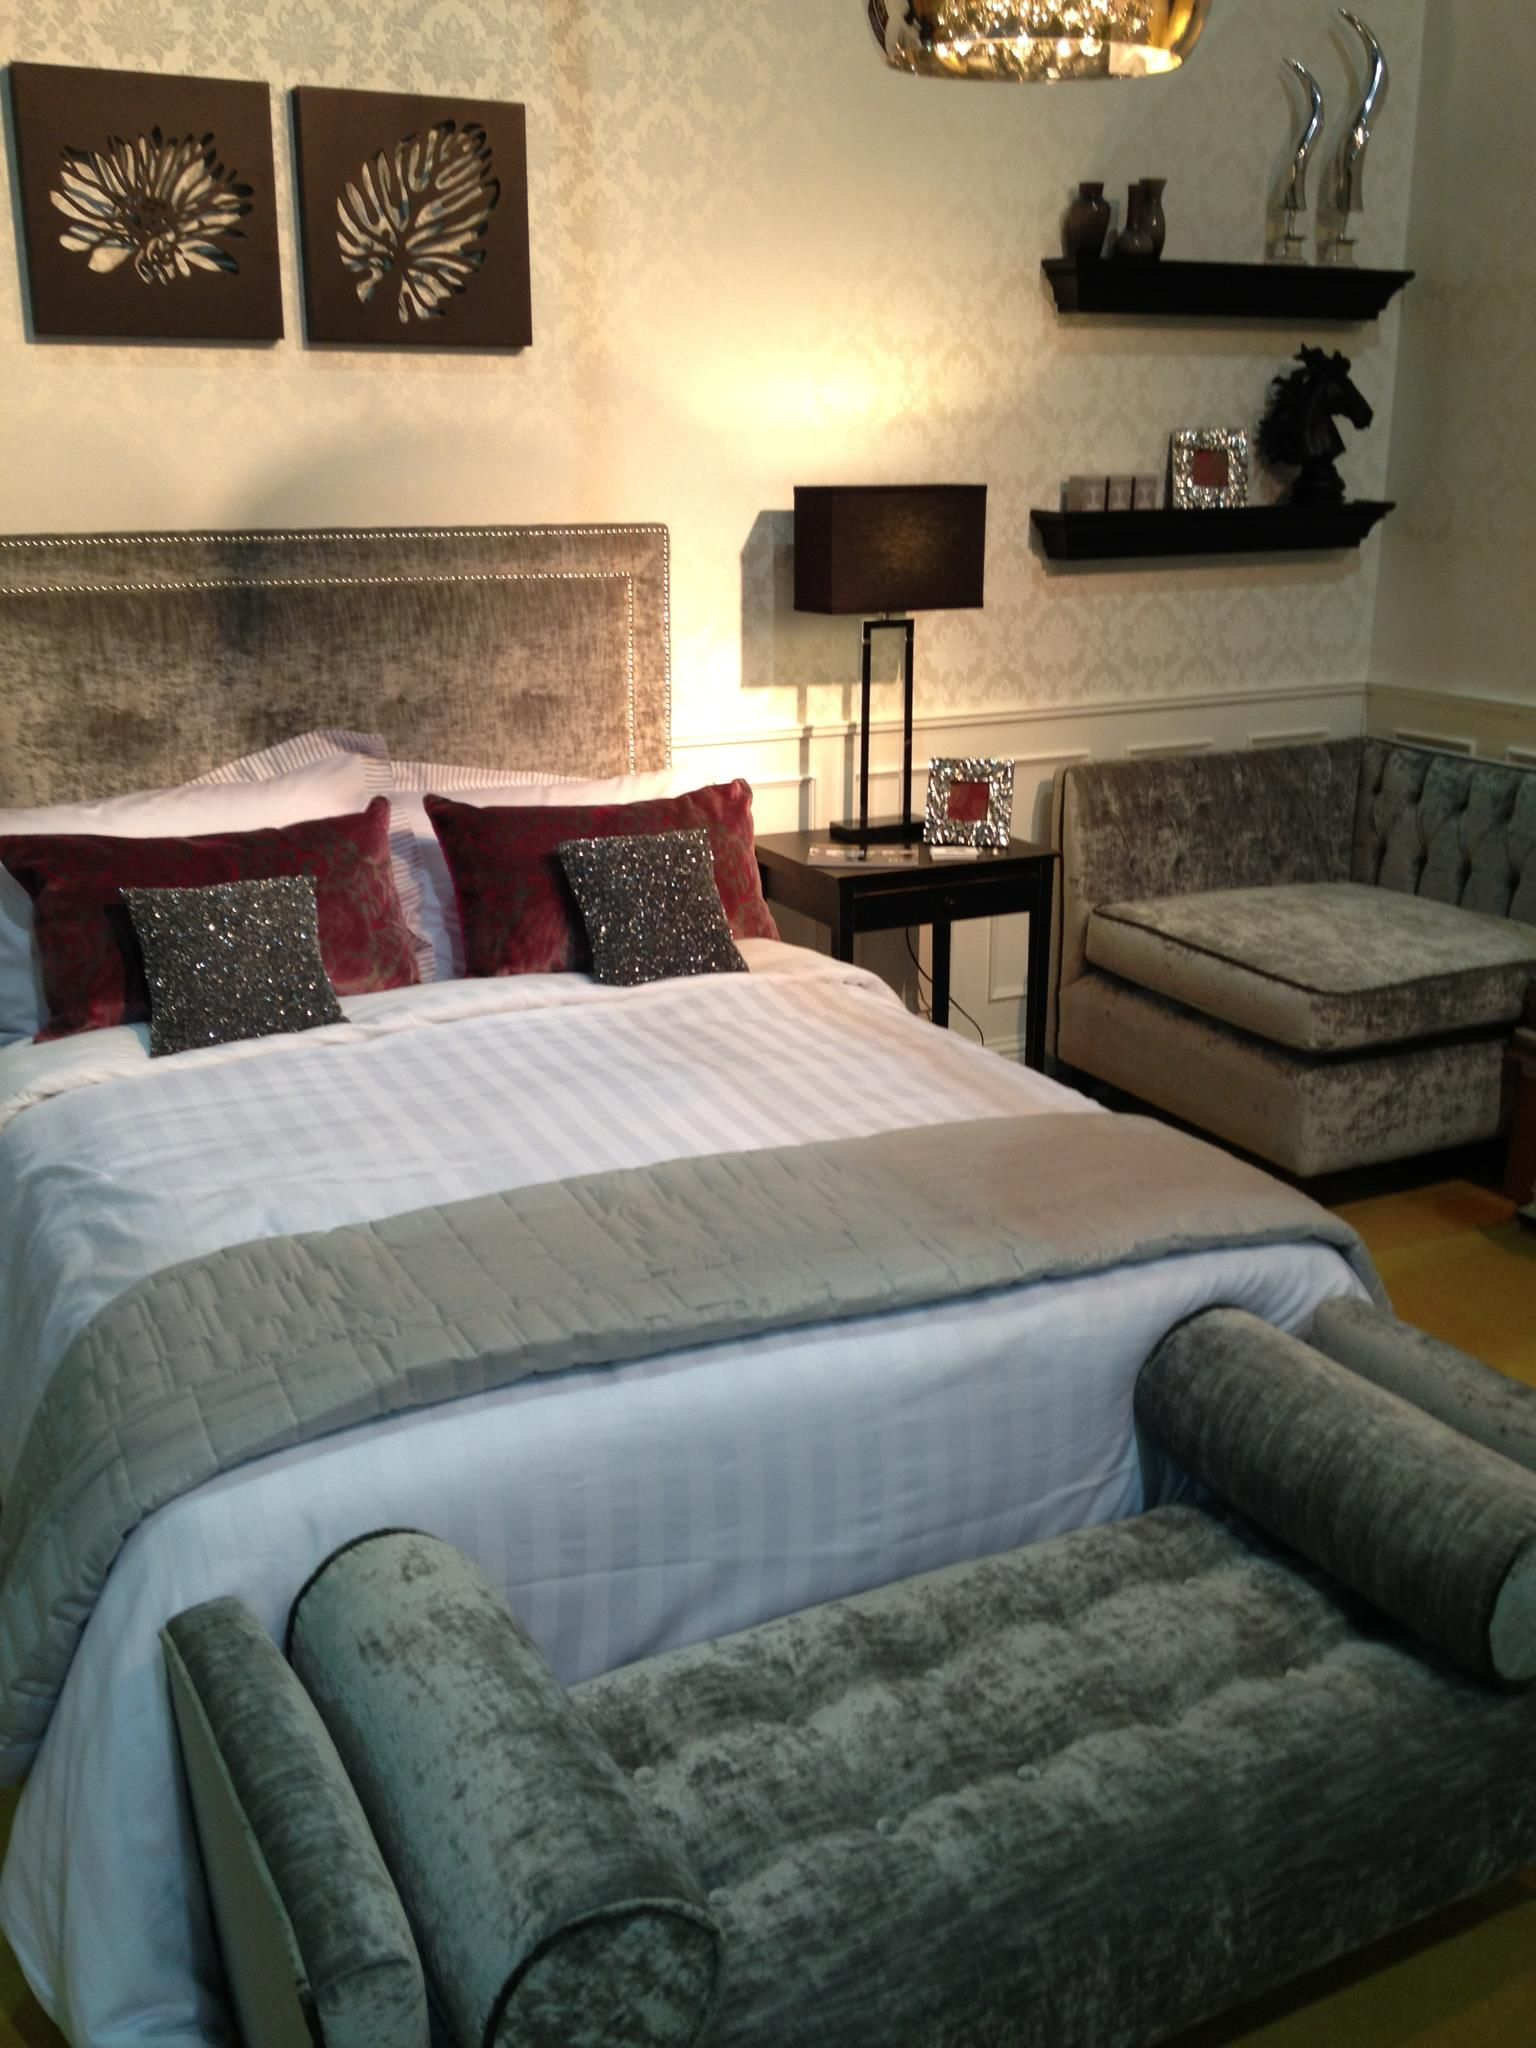 Conbu Interior Design Bedroom Display As Part Of Colortrend Interior Design  Forum, Ideal Home Show